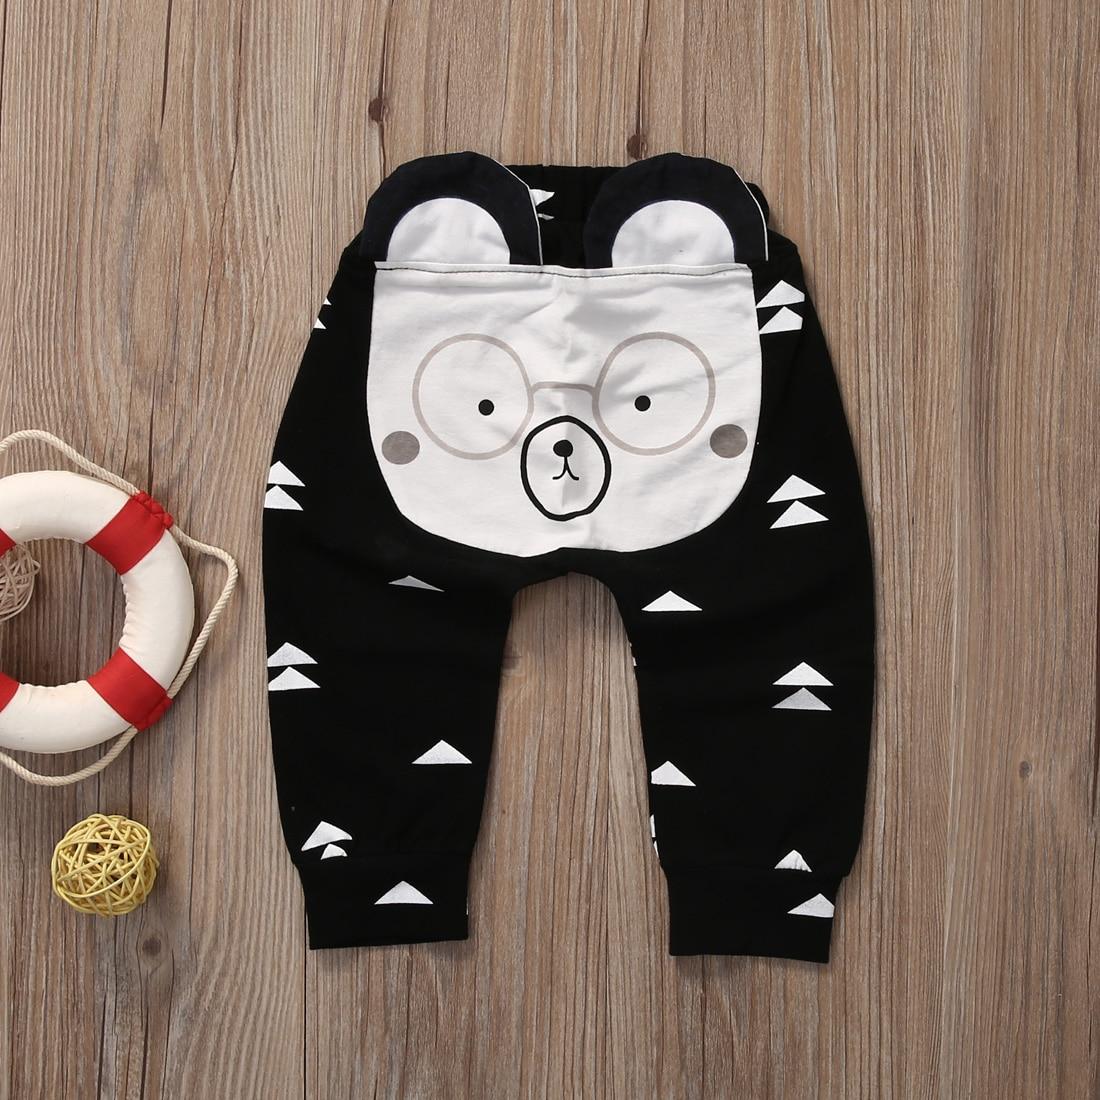 2017-Baby-Girls-Boys-Pants-Cotton-Harem-Pants-Cartoon-Monster-Toddler-Baby-Bottoms-Harem-Trousers-4